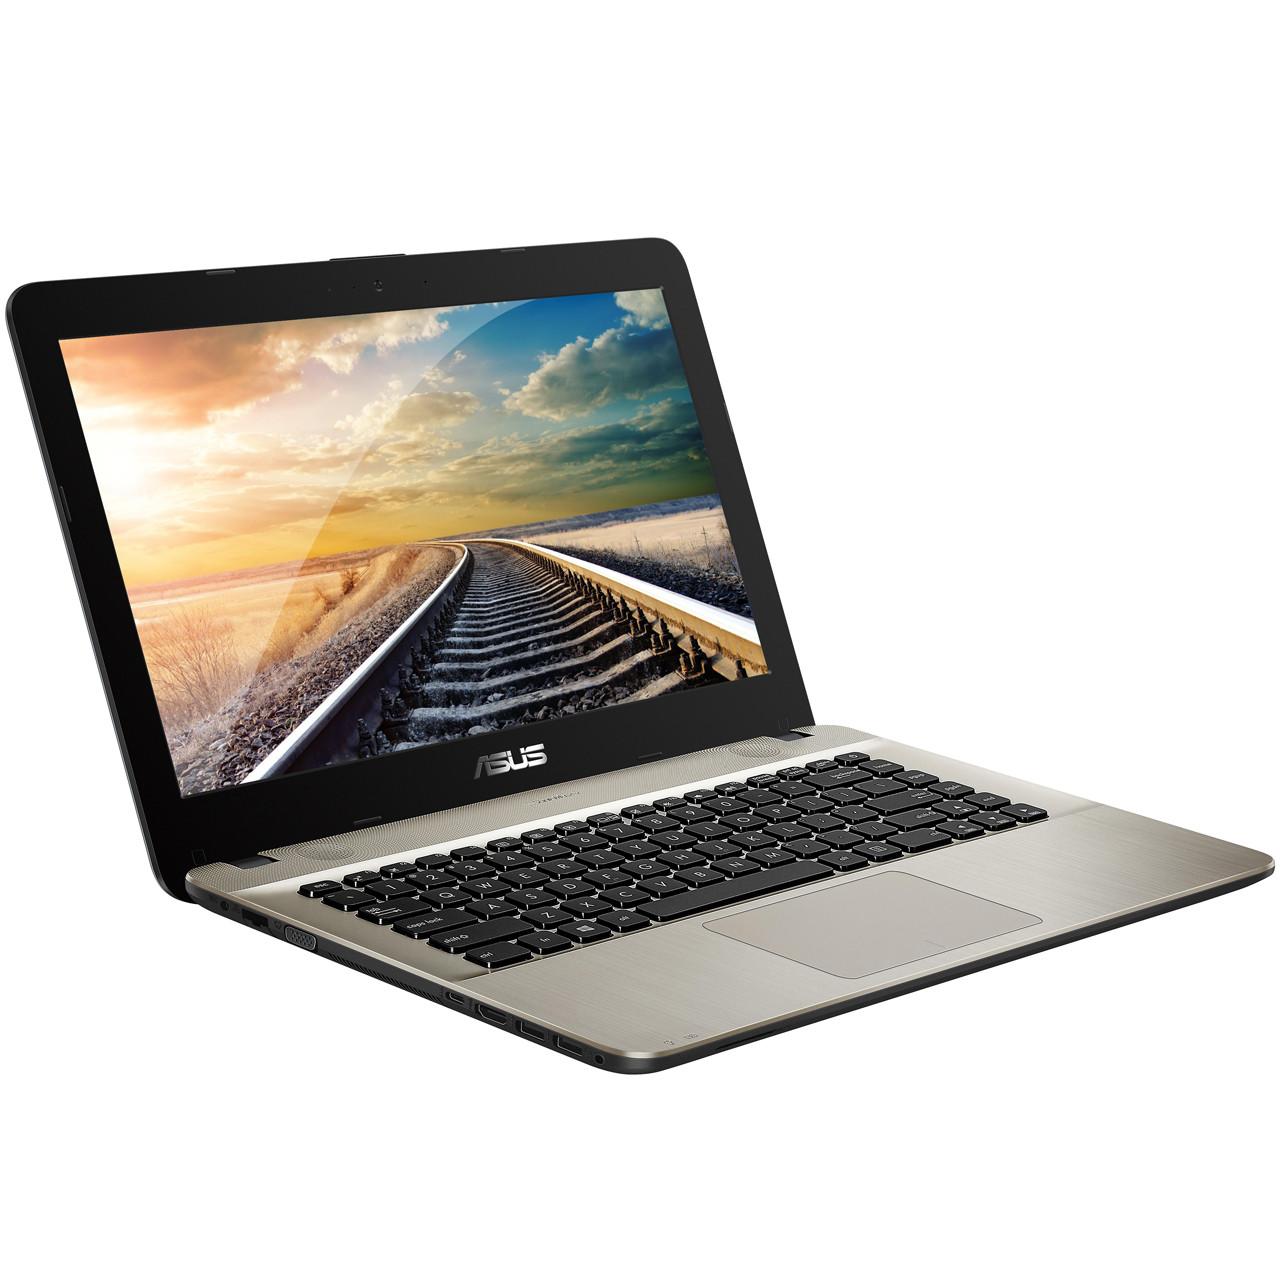 Ноутбук Asus X541SA (X541SA-XO055D) Black LED HD Intel Celeron 1.6 GHz DDR3 4Gb HDD 500Gb Intel HD Graphics